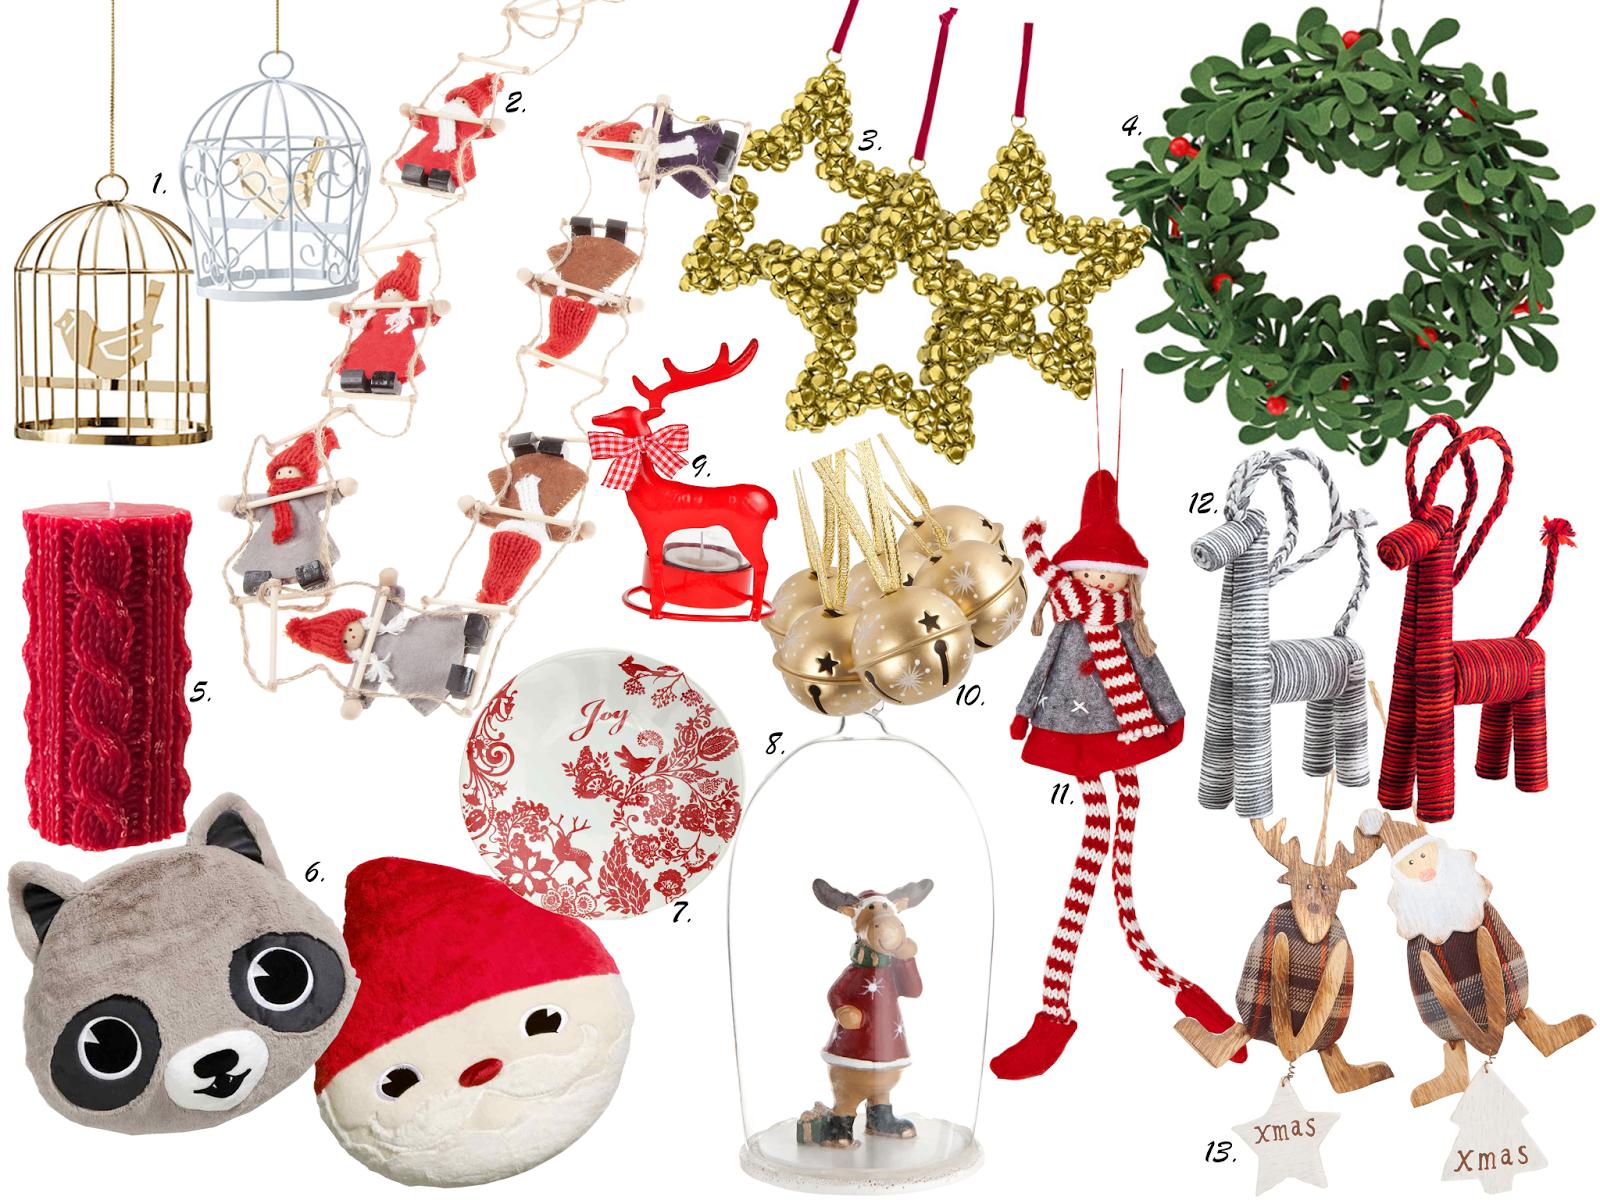 Speciale natale addobbi natalizi ilenia 39 s wardrobe - Ikea addobbi natalizi ...